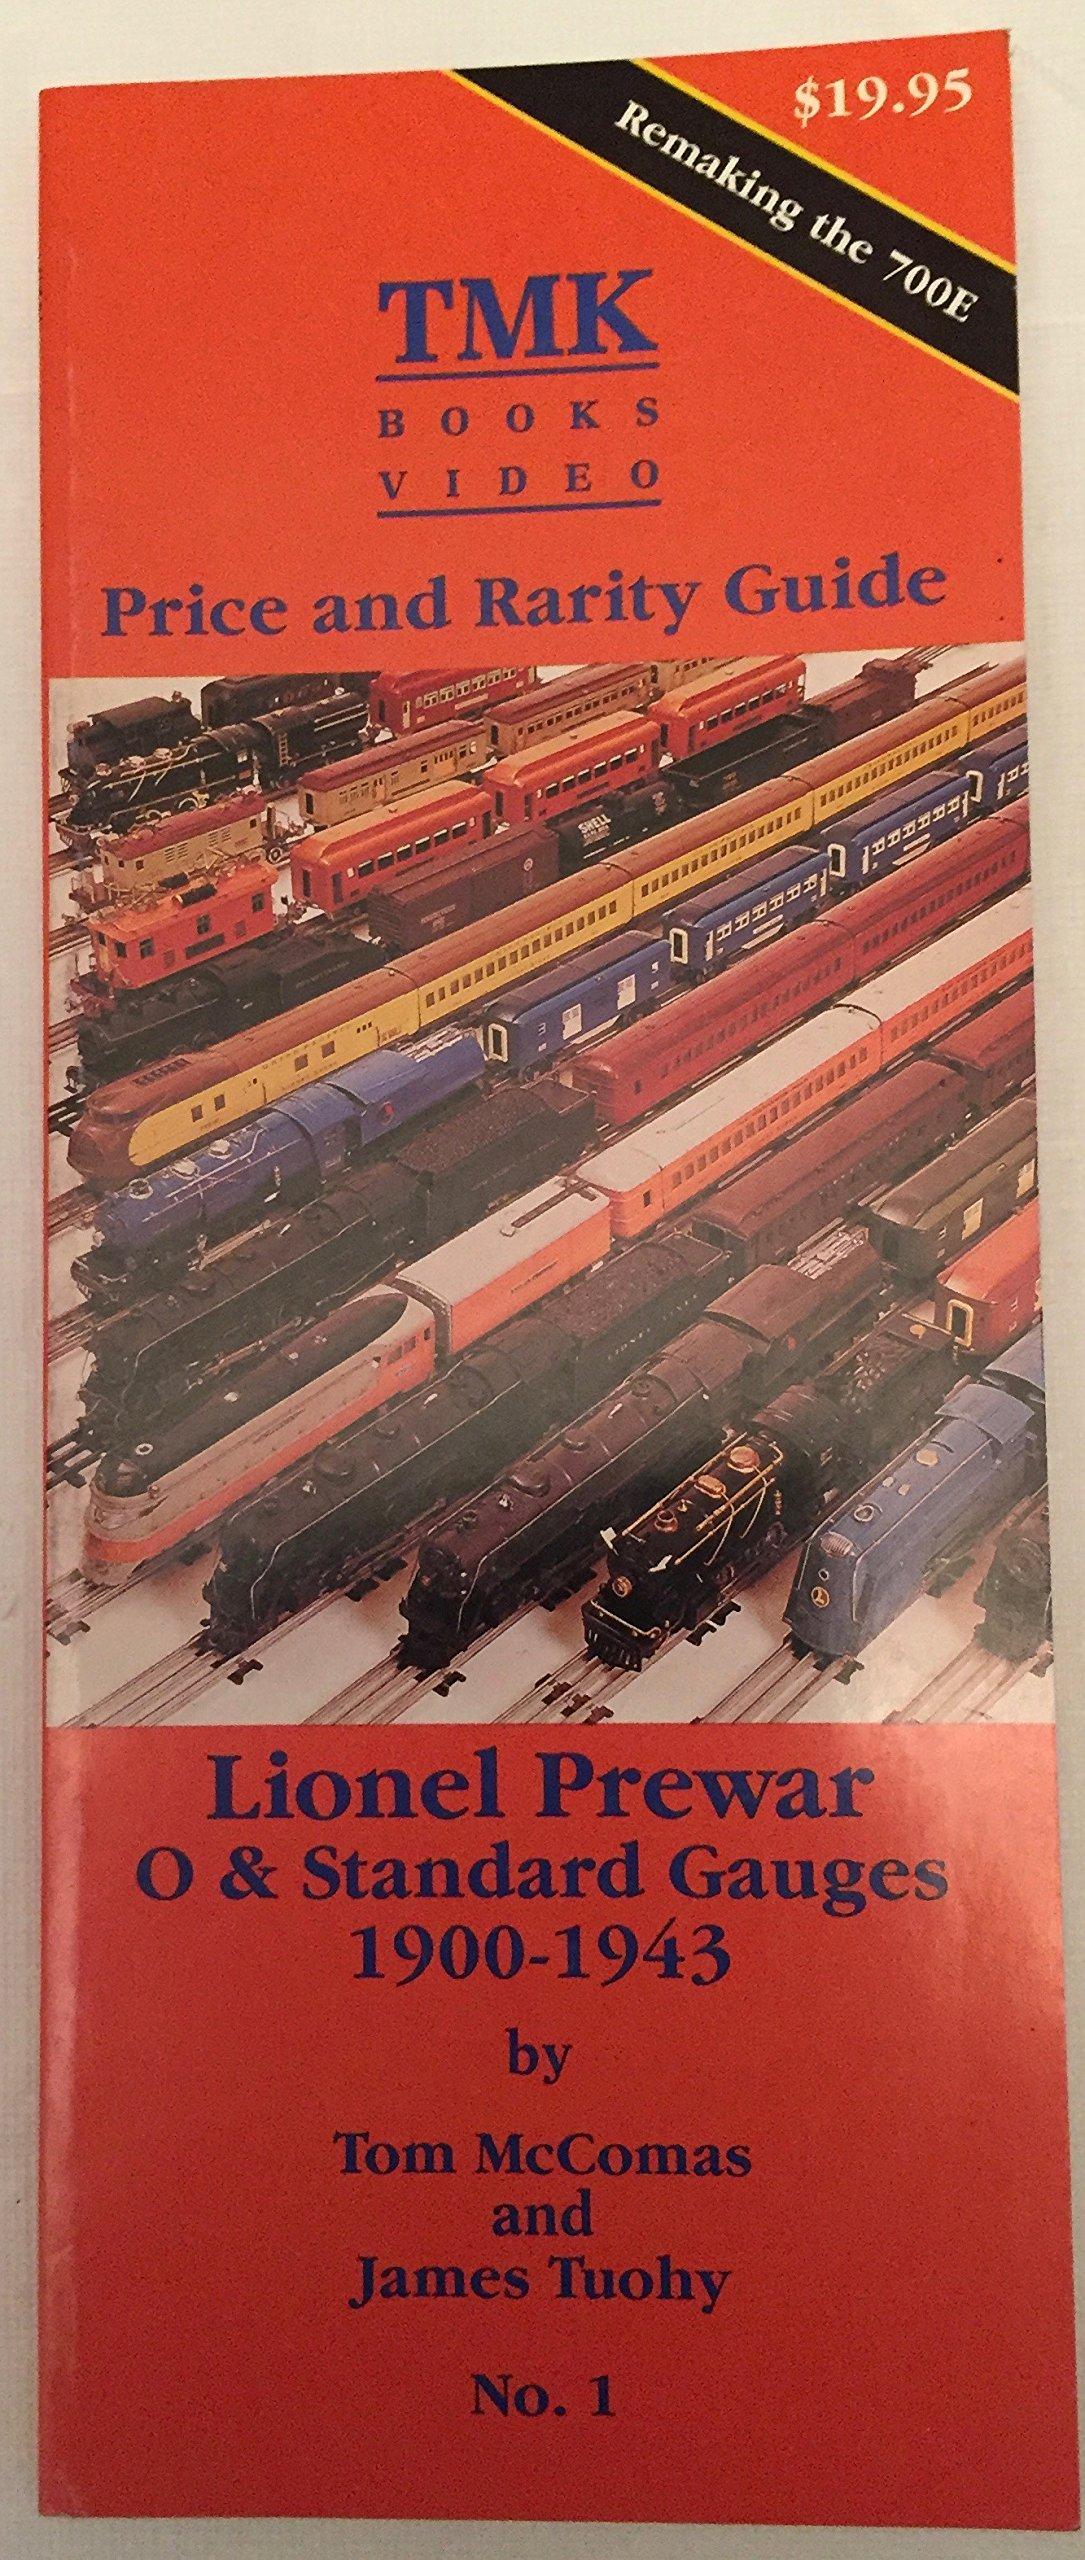 lionel prewar o standard gauges 1900 1943 price and rarity guide rh amazon com Rarity as a Human My Little Pony Rarity